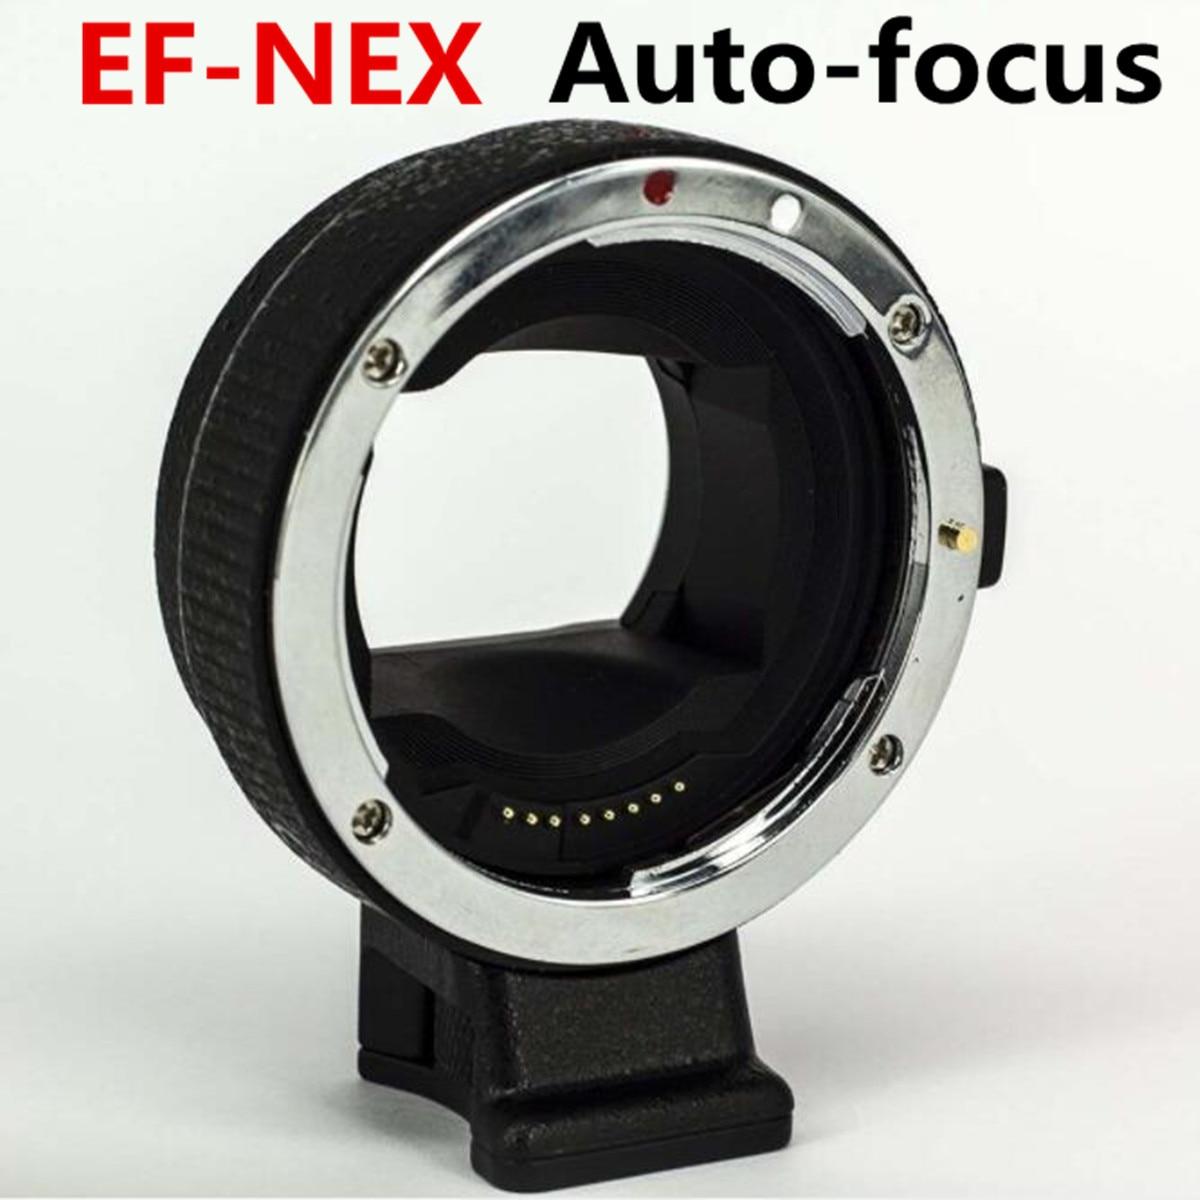 EF-NEX Auto Focu Lens Adapter for Canon EOS EF Mount Lens For Sony E Adapter NEX A7 A7R II Camera Full FrameEF-NEX Auto Focu Lens Adapter for Canon EOS EF Mount Lens For Sony E Adapter NEX A7 A7R II Camera Full Frame